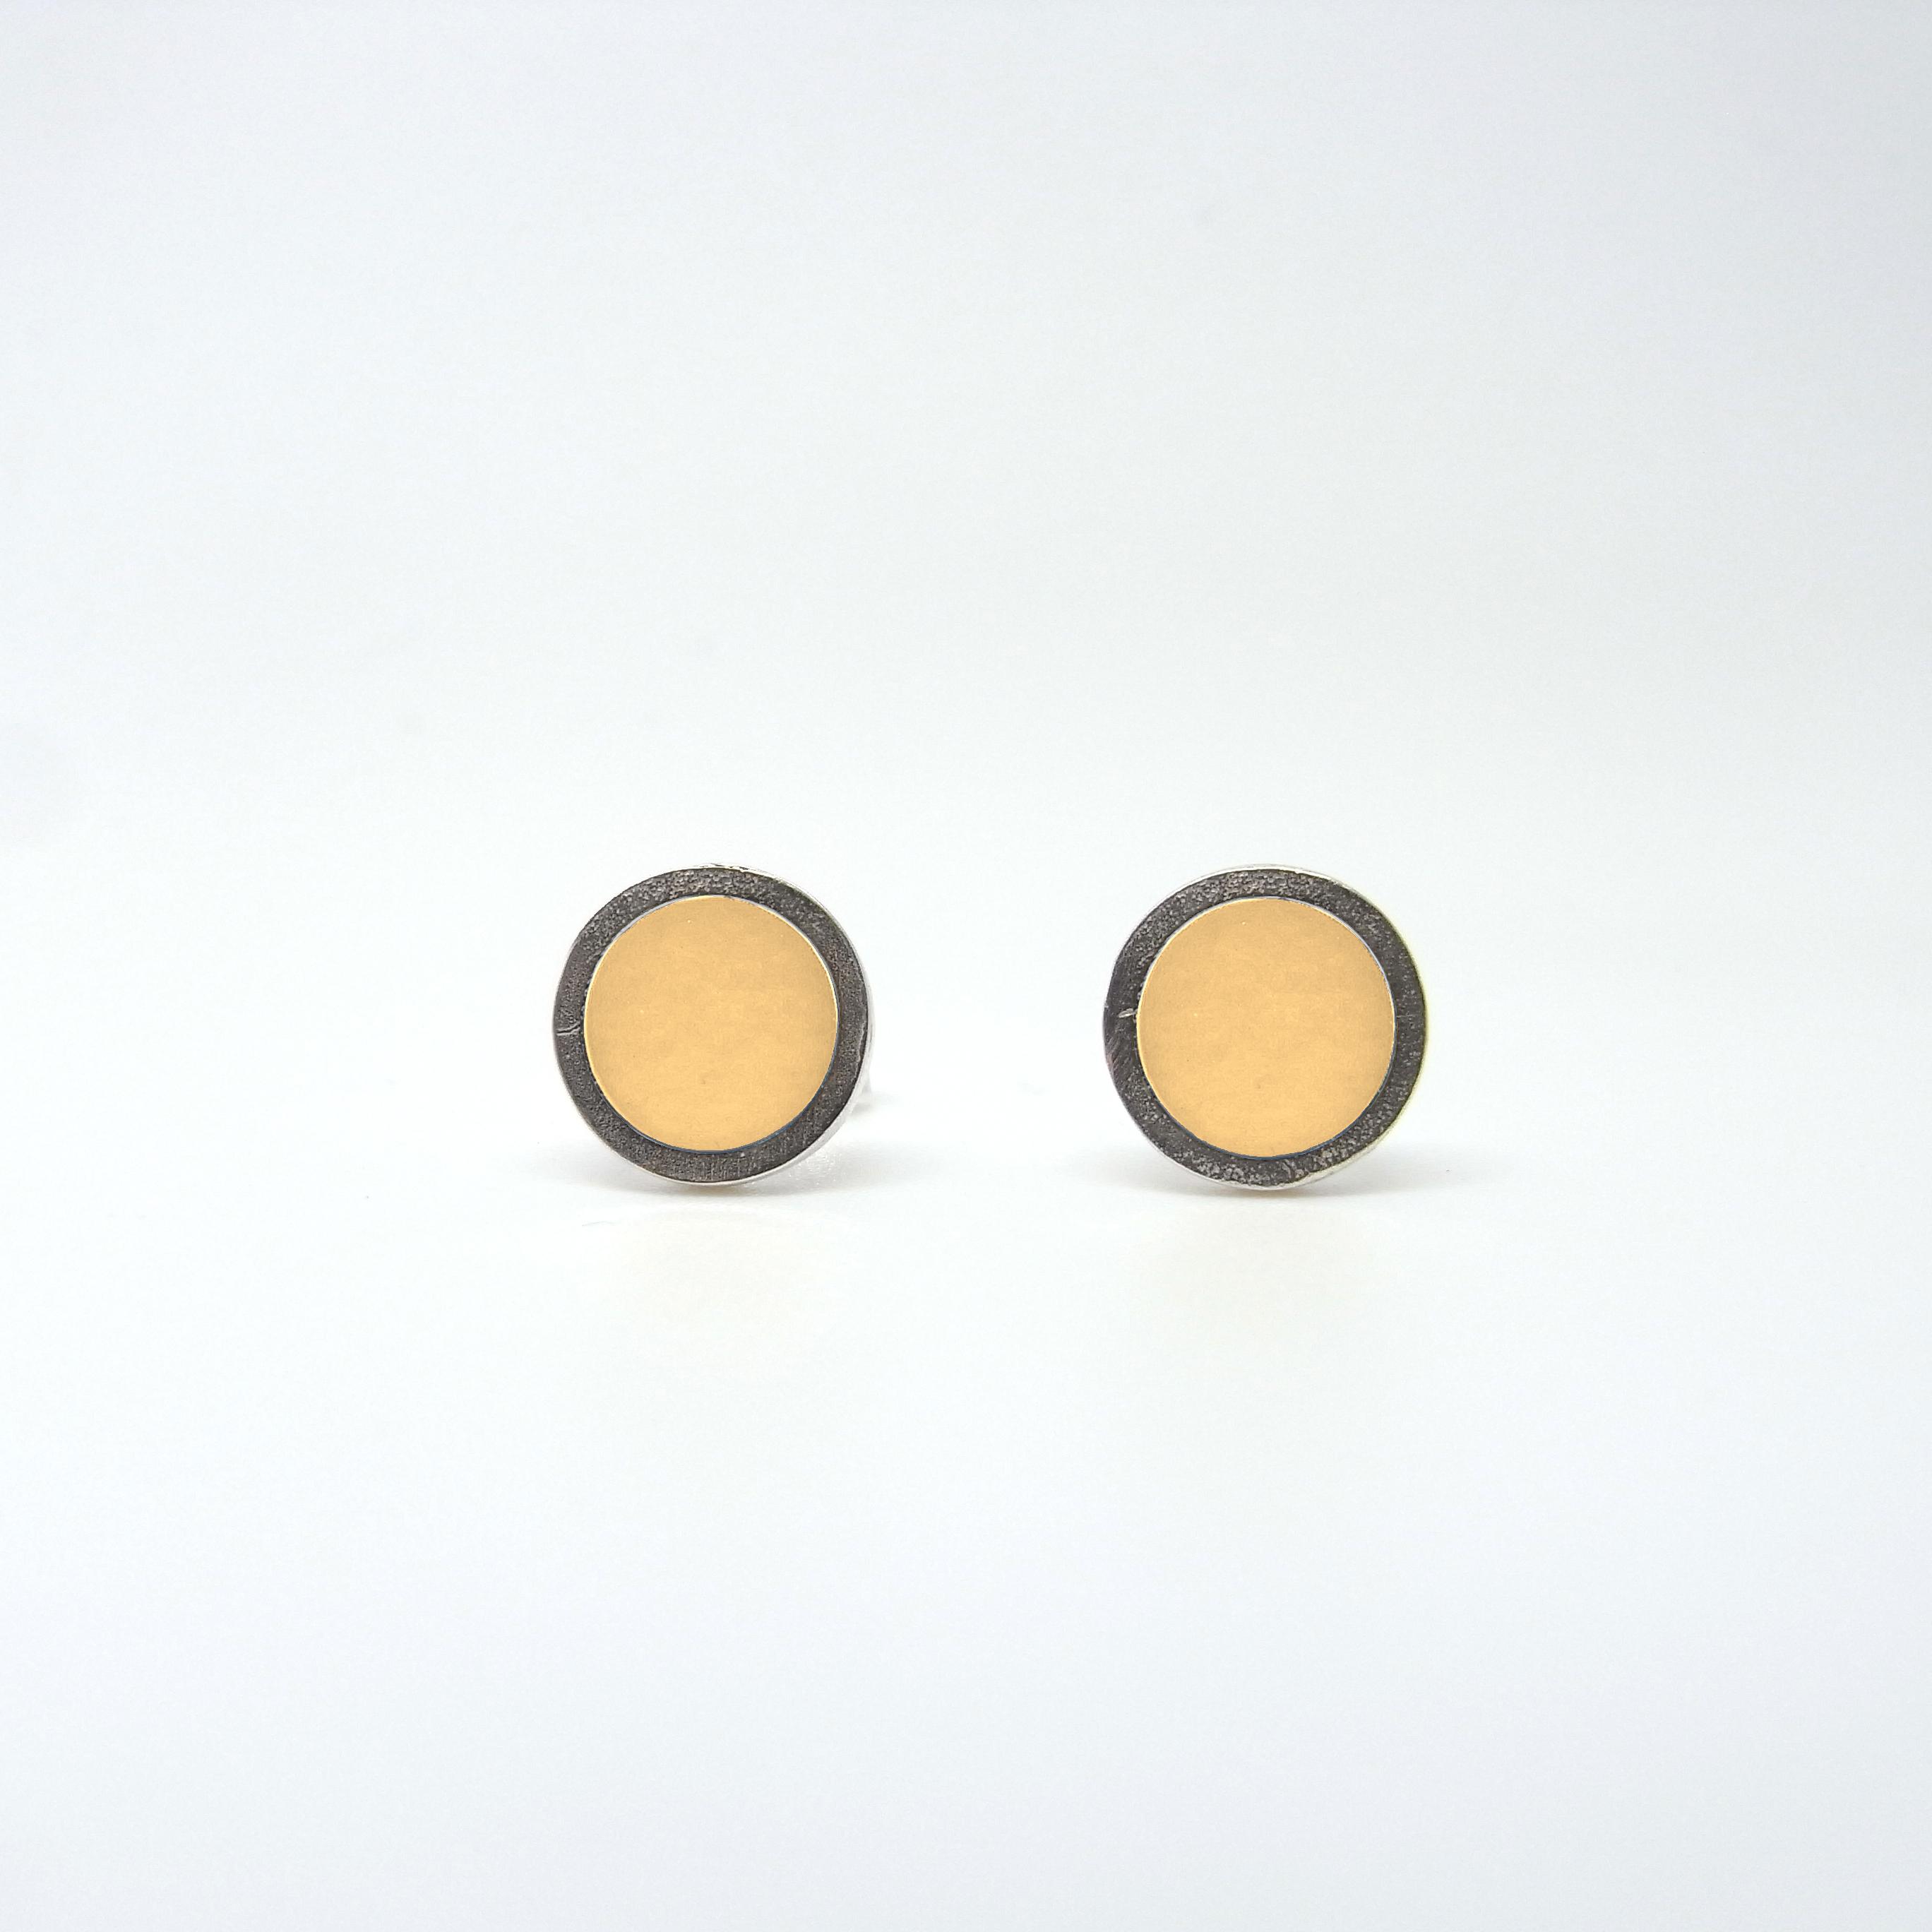 SALE - Small Coloured Dot Studs Peach